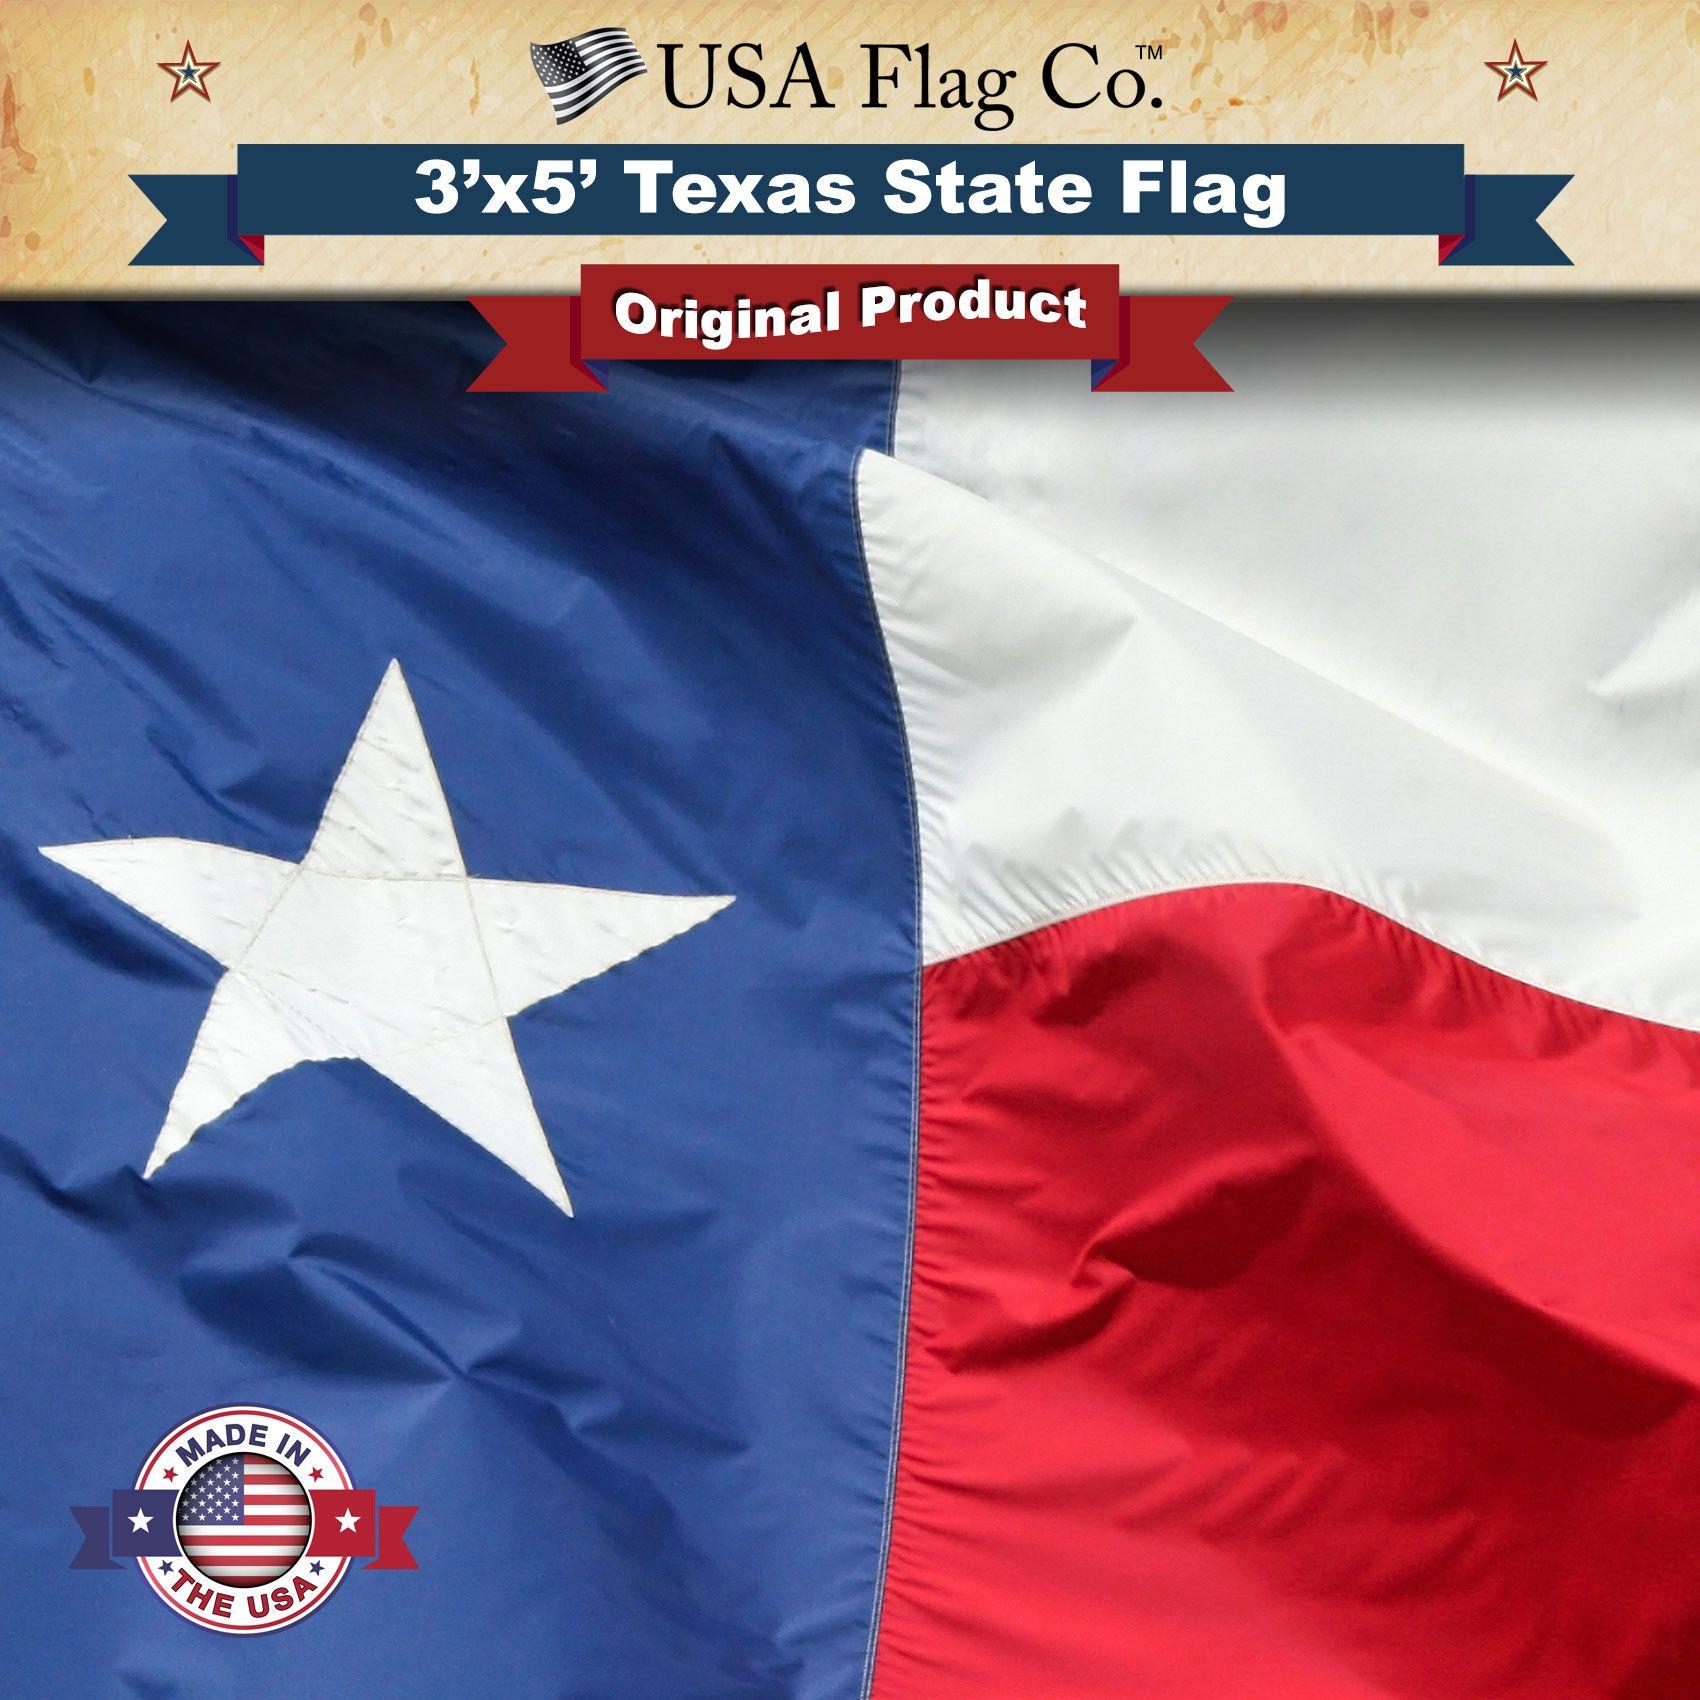 Texas Flag Texas Flags Flag Texas State Flag